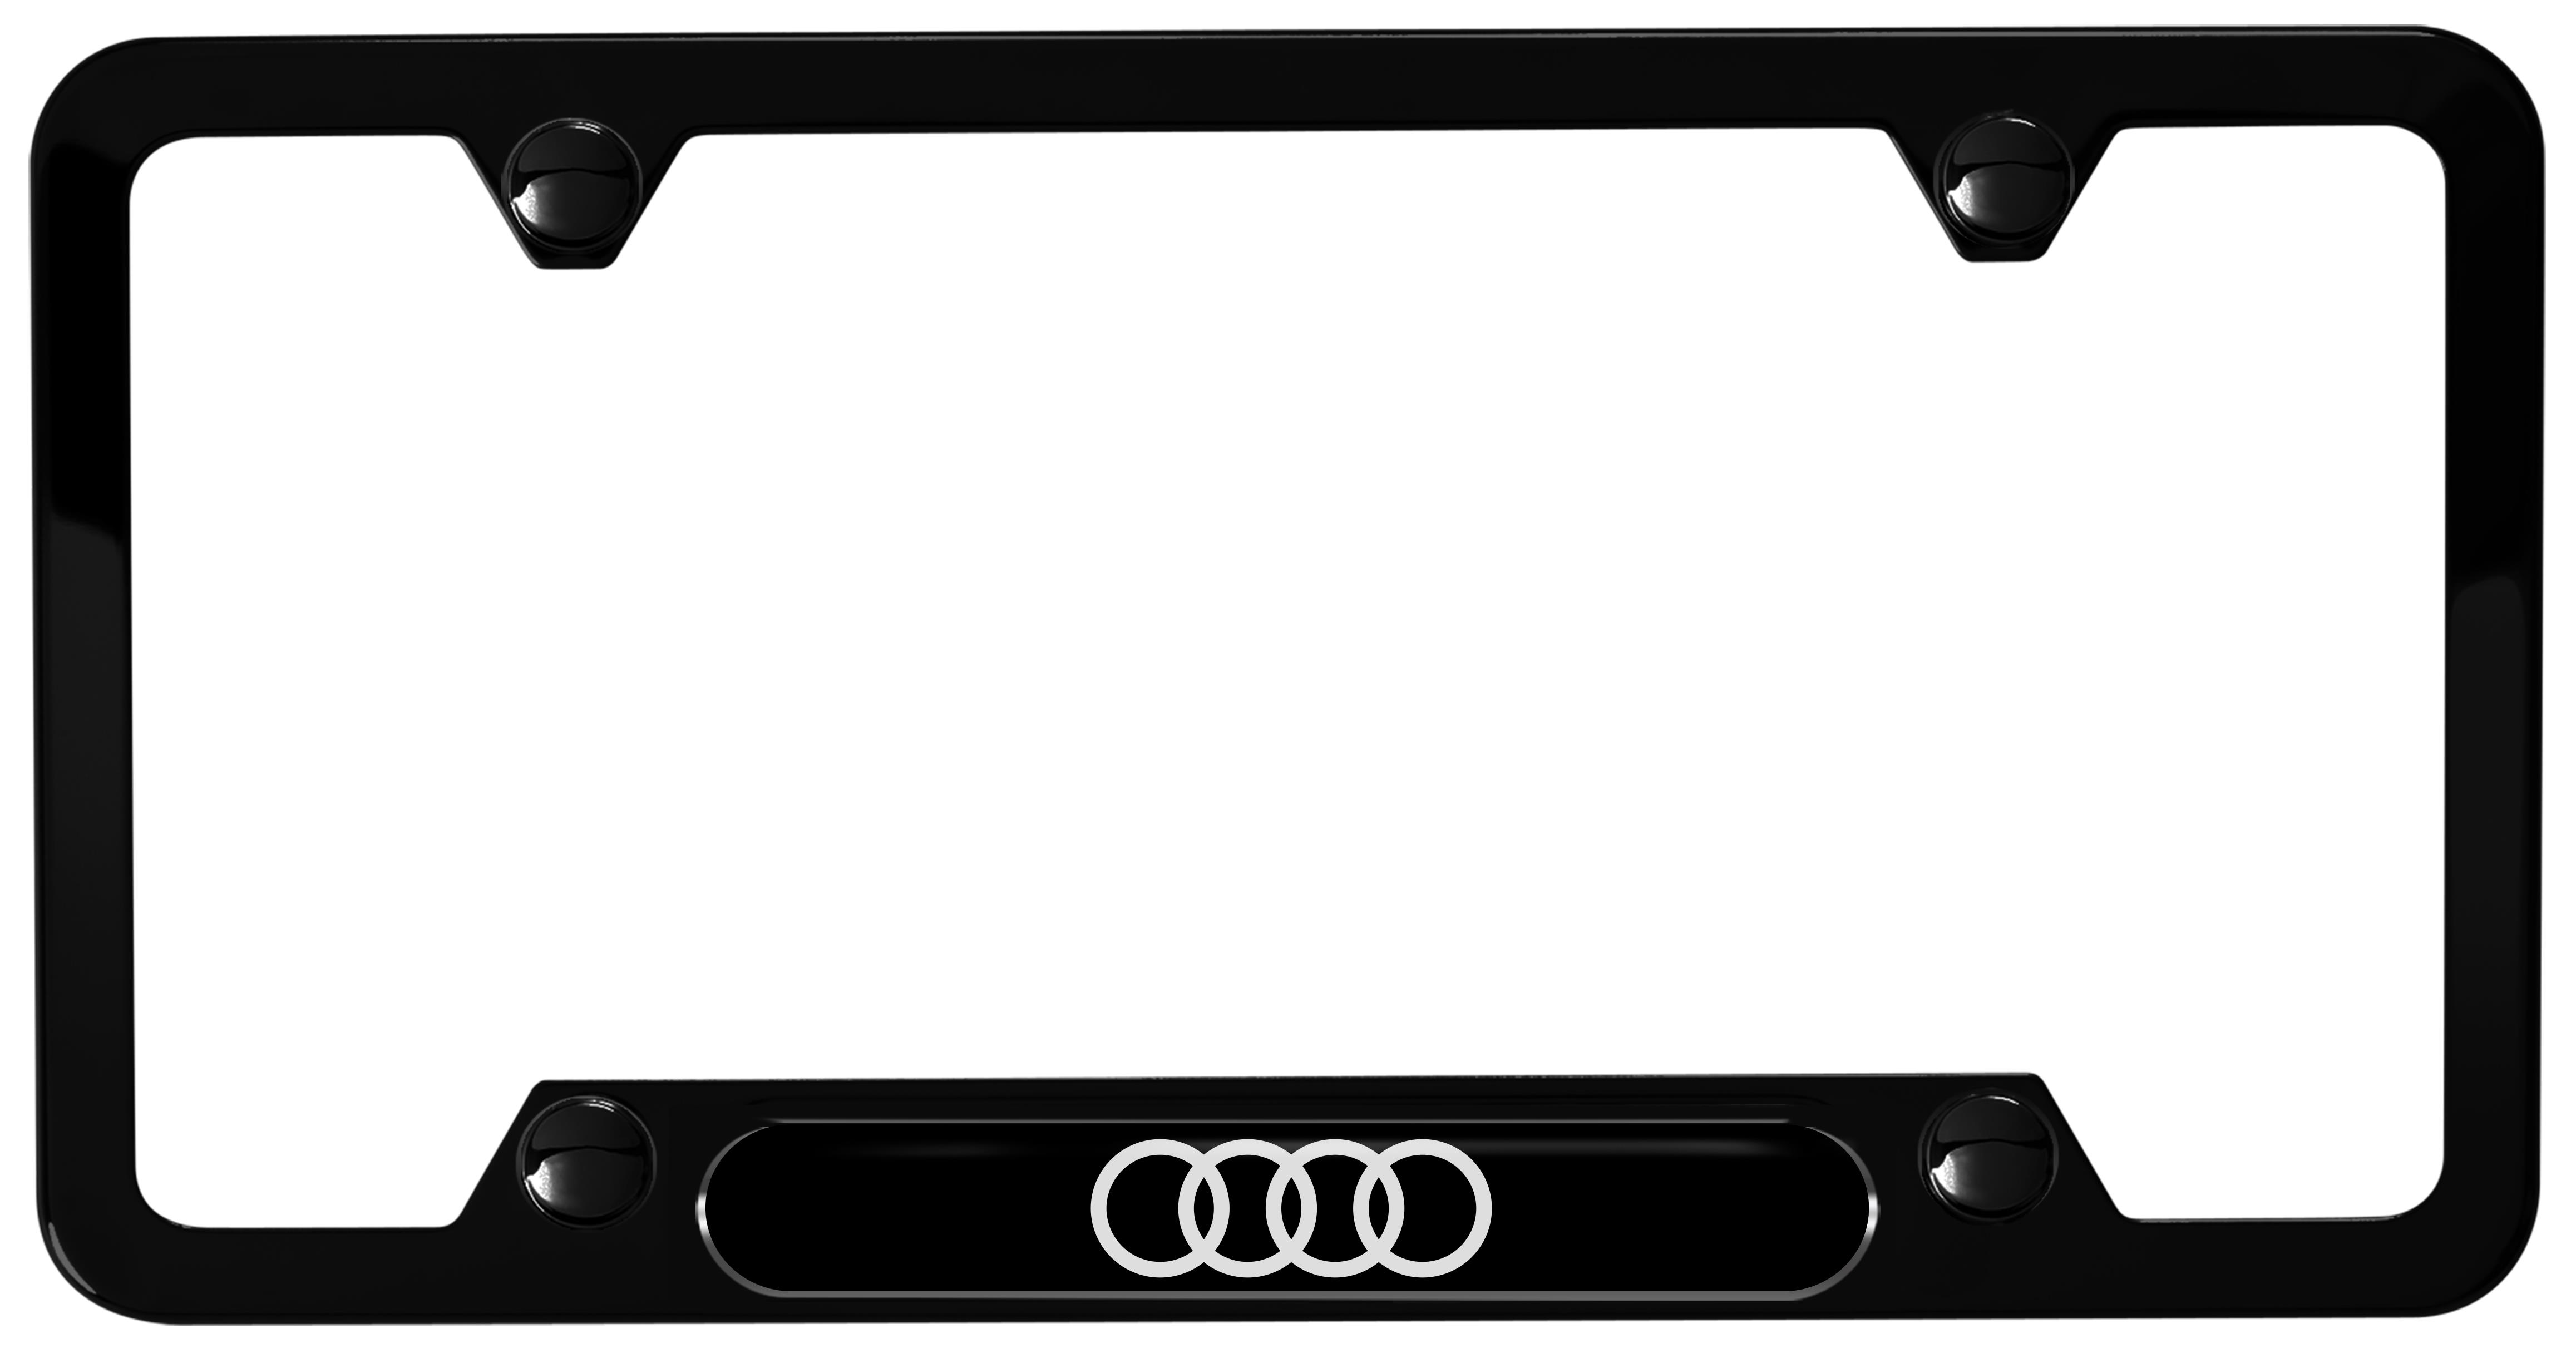 2018 Audi Q5 Audi rings license plate frame, black powder coated stainless steel - ZAW071801HDX9 ...